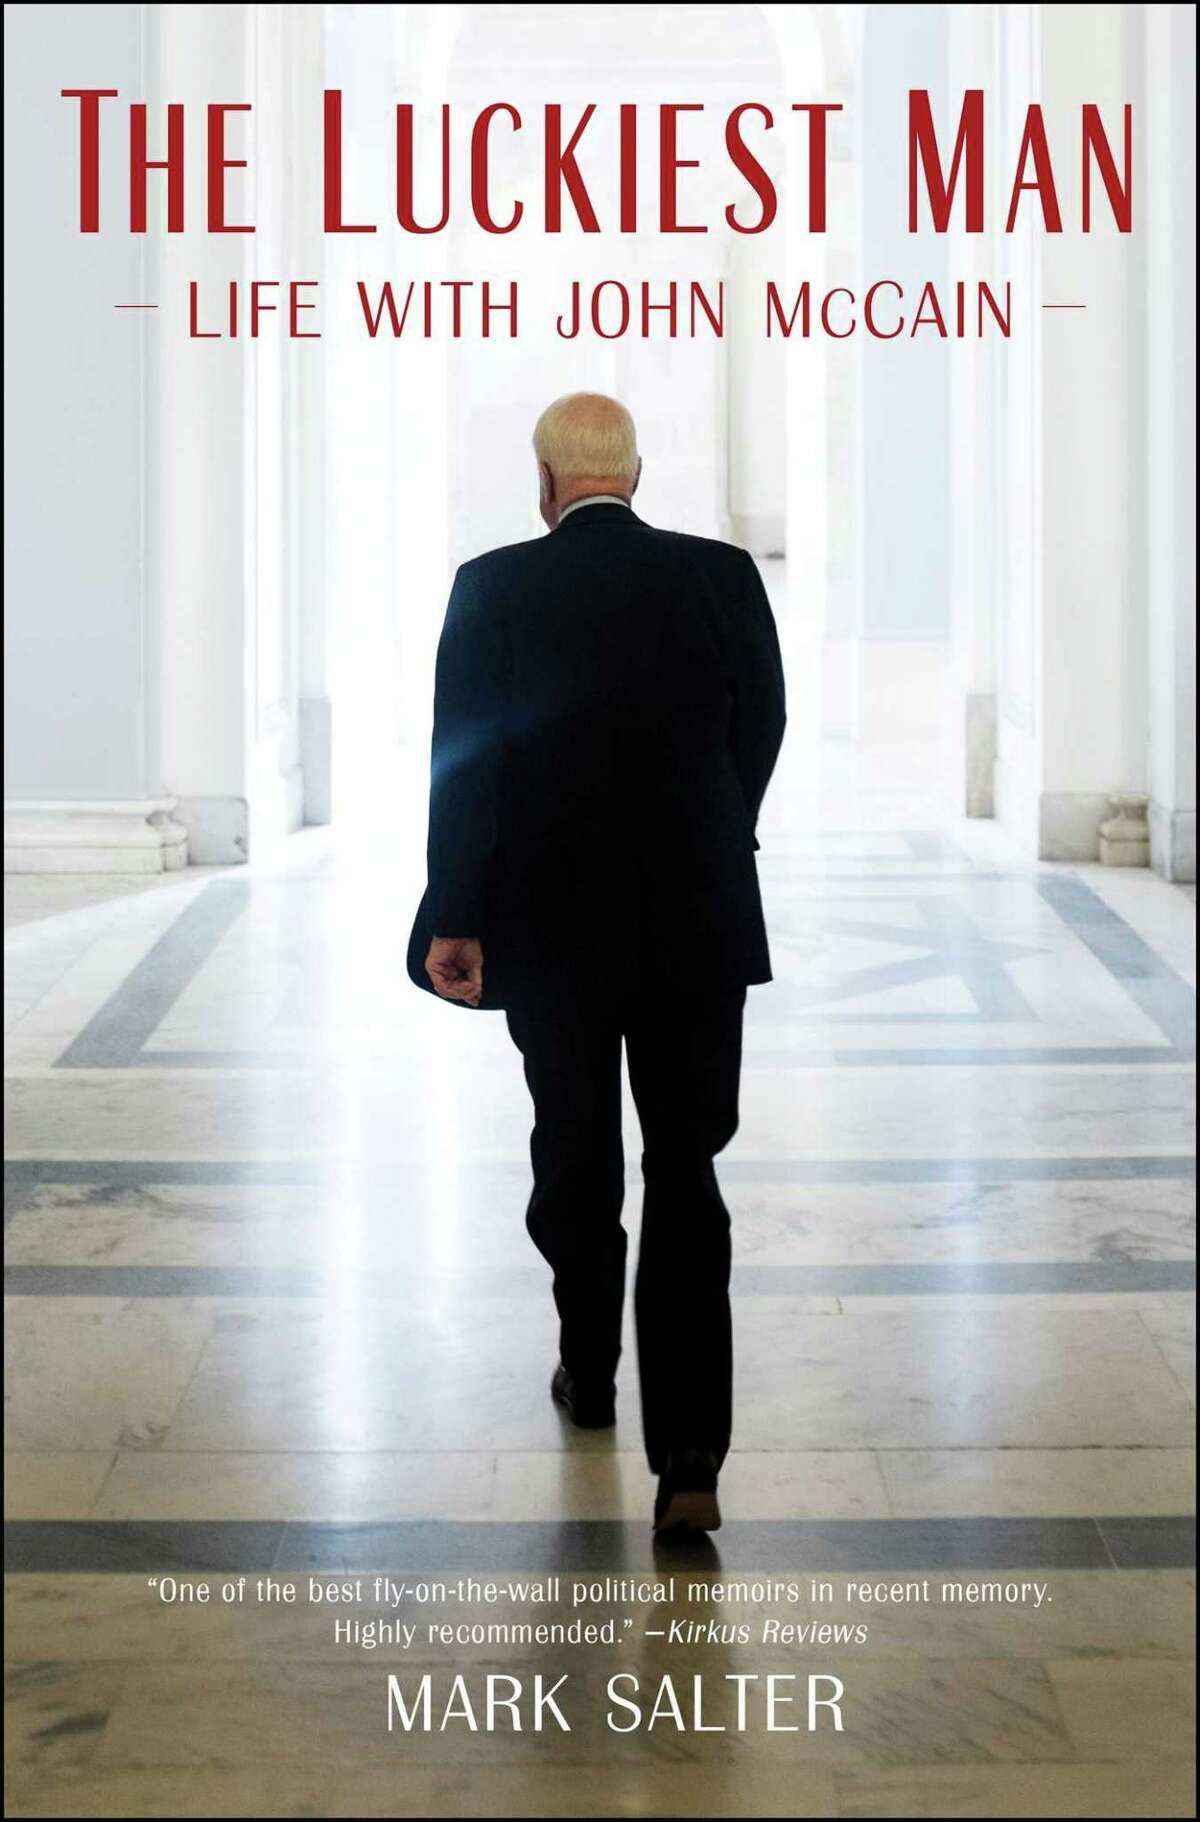 The Luckiest Man: Life With John McCain